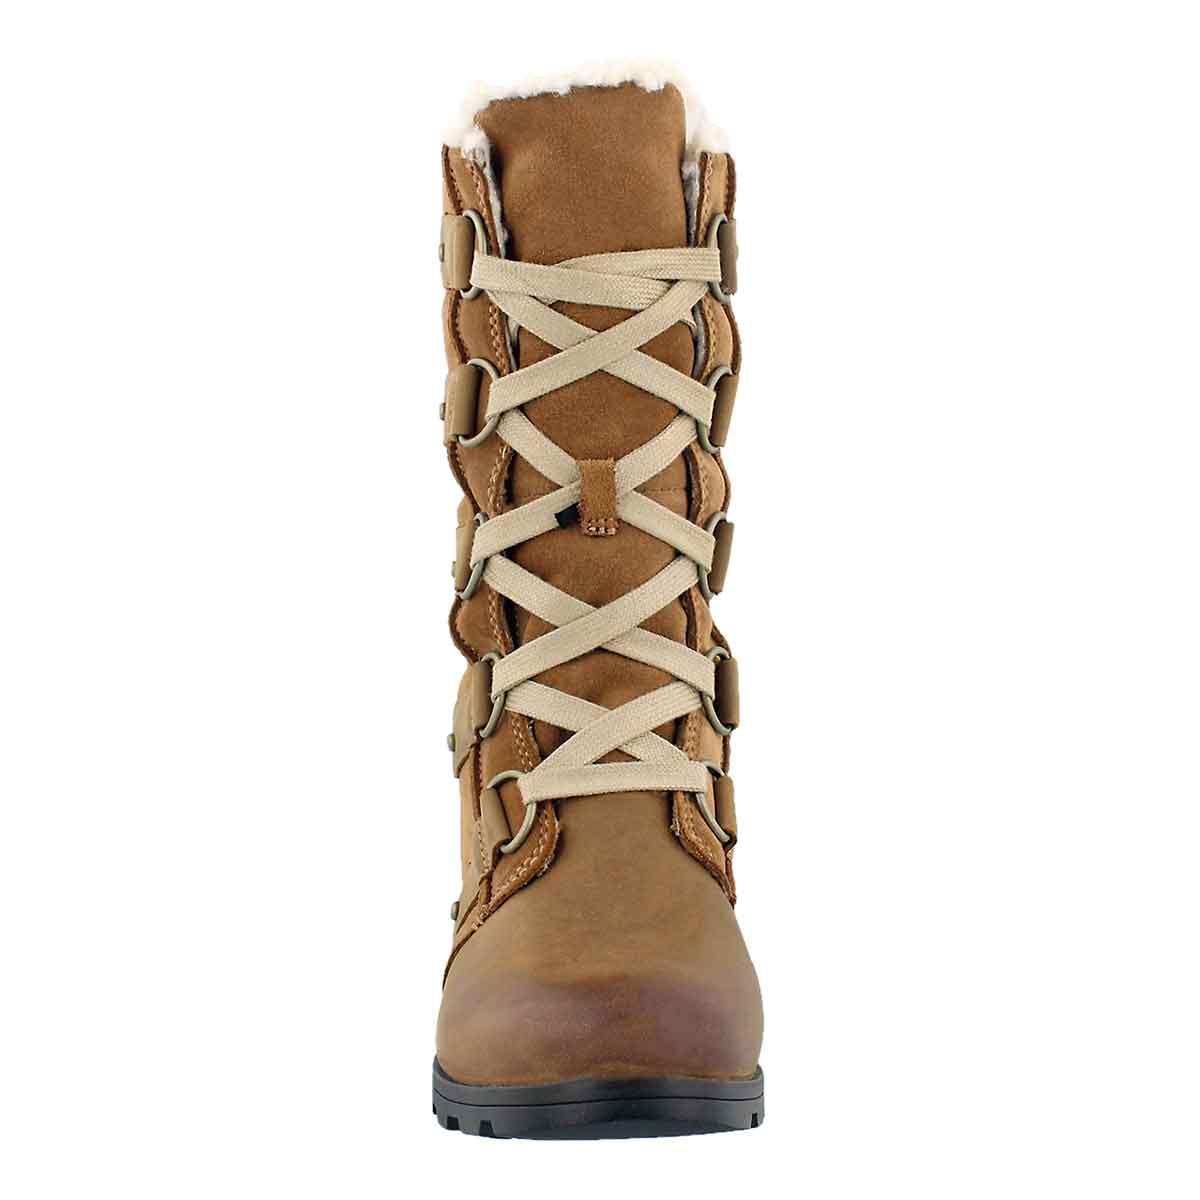 Lds Emelie Lace elk/crdv waterproof boot